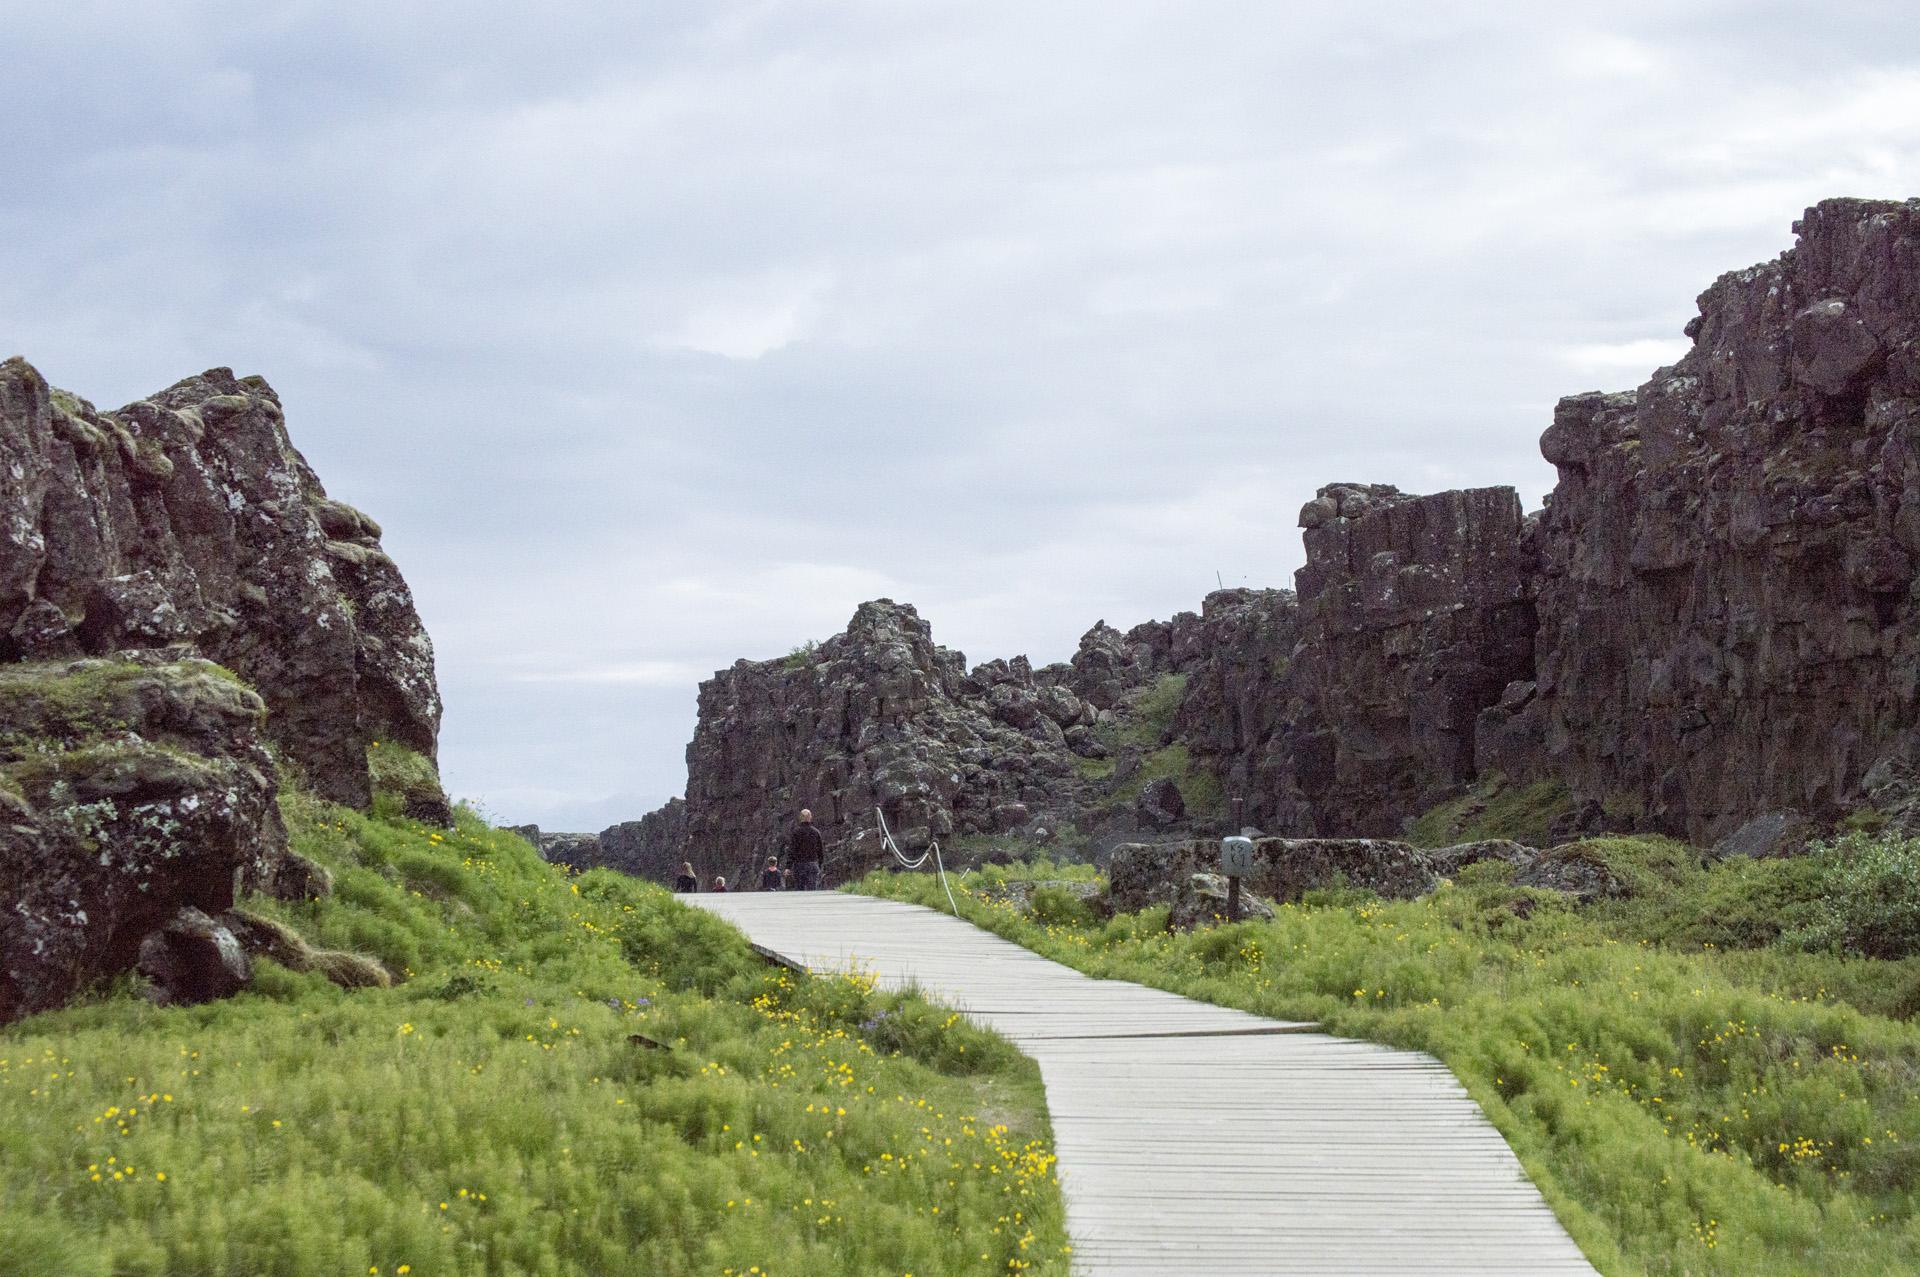 Walking along the rift valey between the Eurasian and North American (right) tectonic plates, Þingvellir National Park, Suðurland region, Iceland.